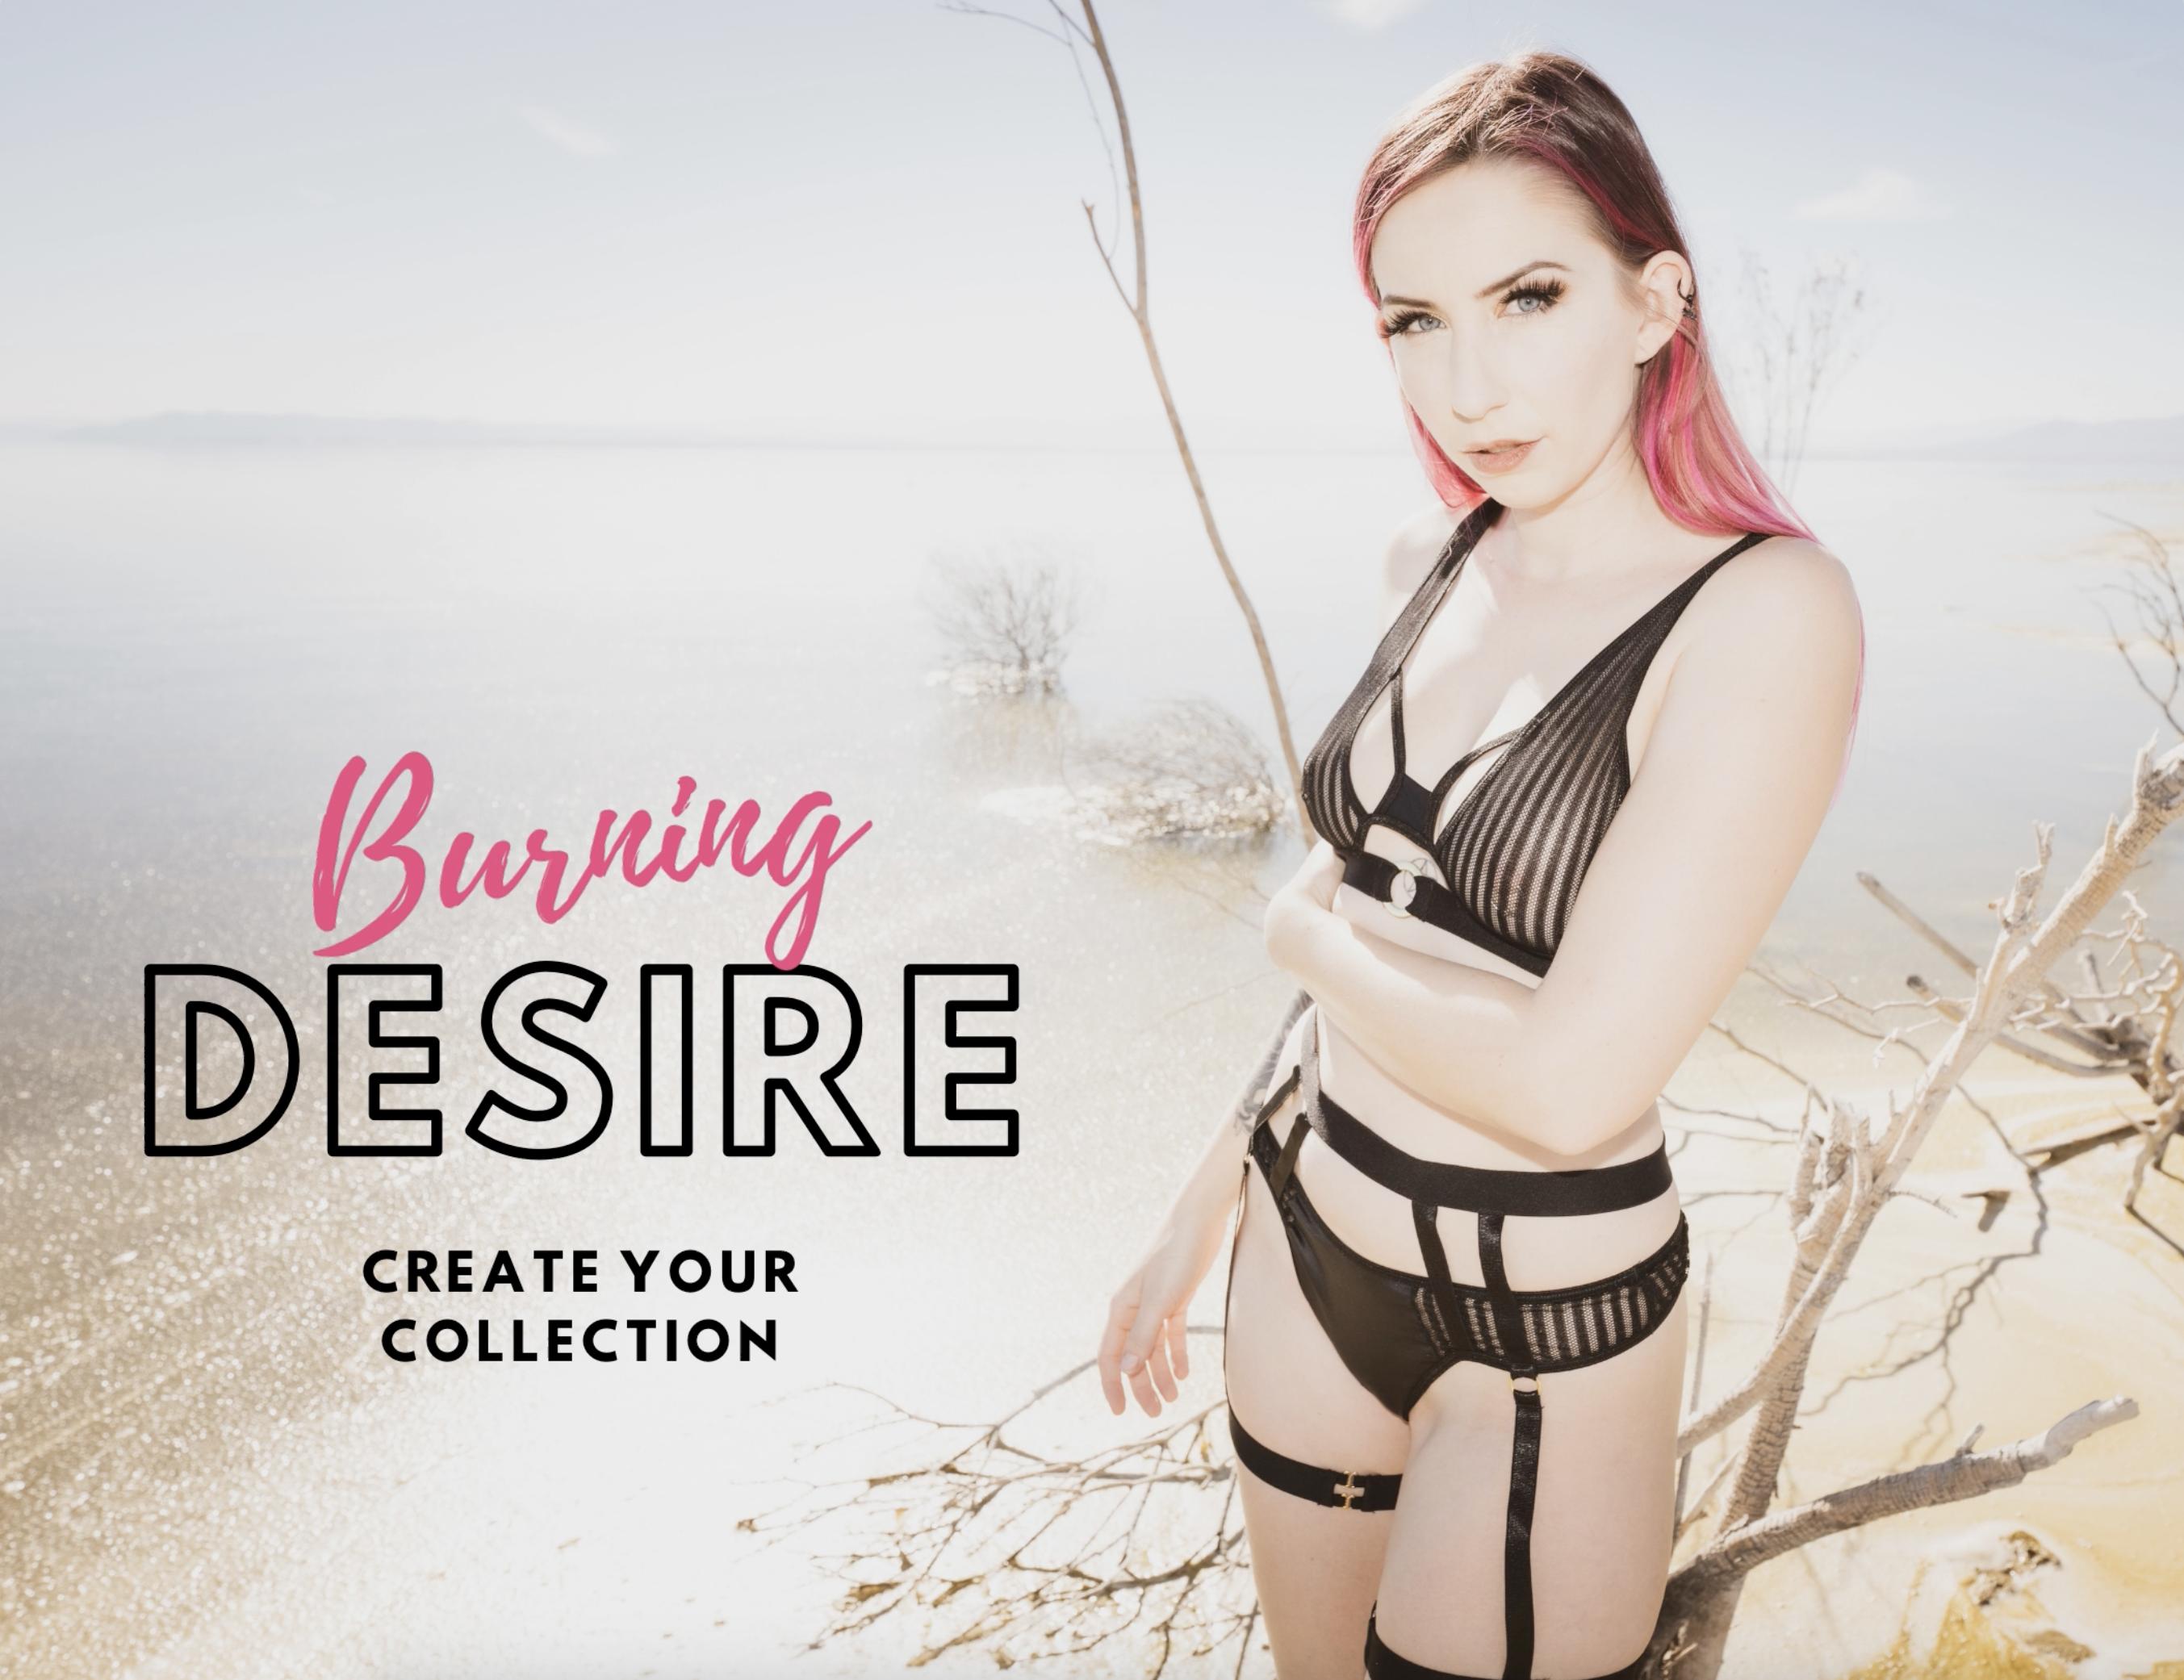 burning man, Coachella, festival, burner, lingerie, sexy